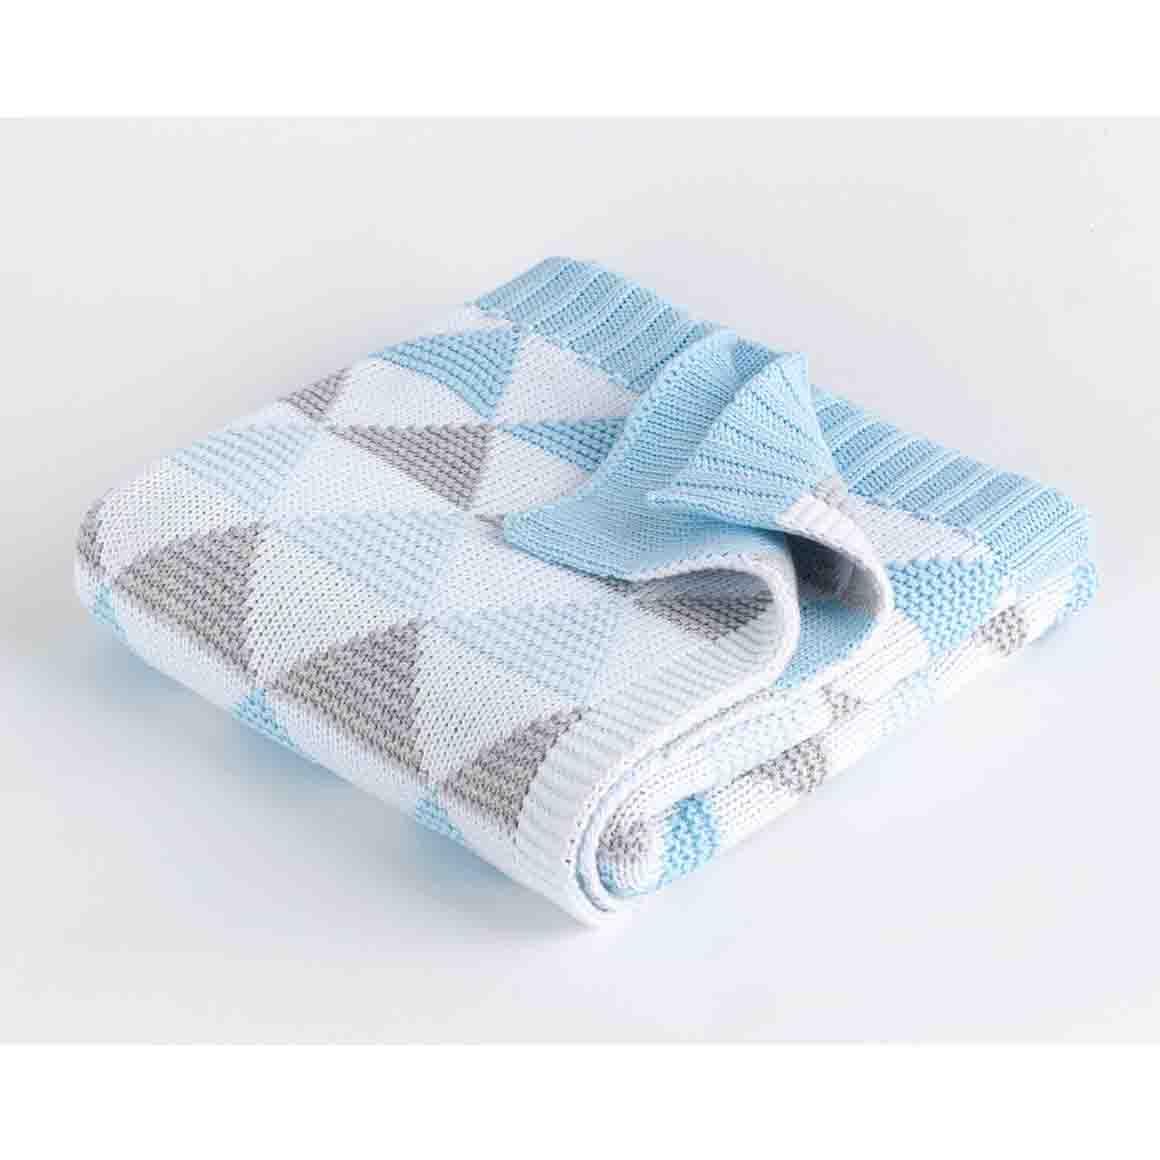 Spotty Giraffe Cot Blanket 100% Cotton double knit - BLUE TRIANGLE | Trada Marketplace